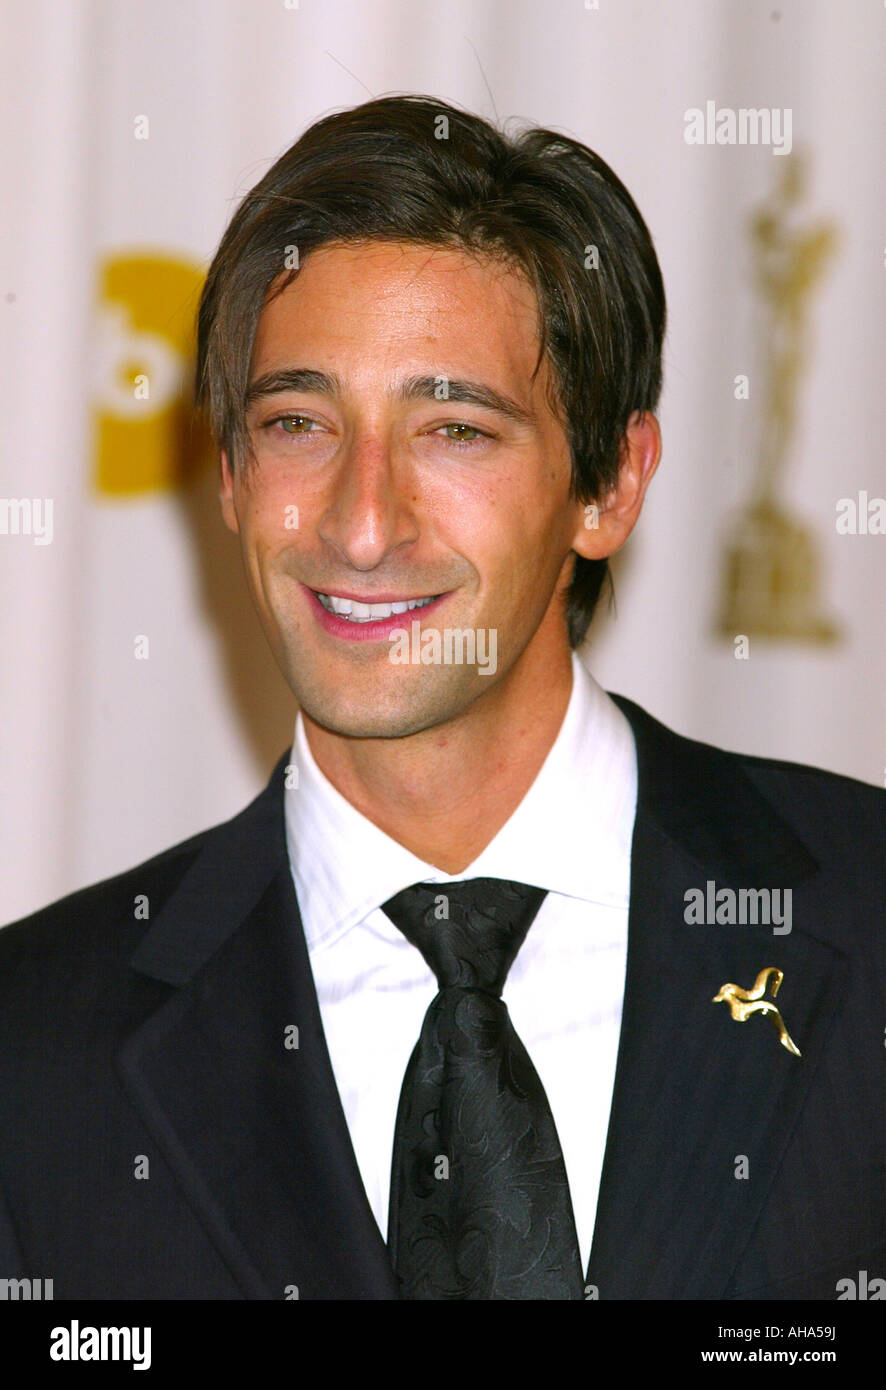 ADRIEN BRODY  US actor in 2003 - Stock Image